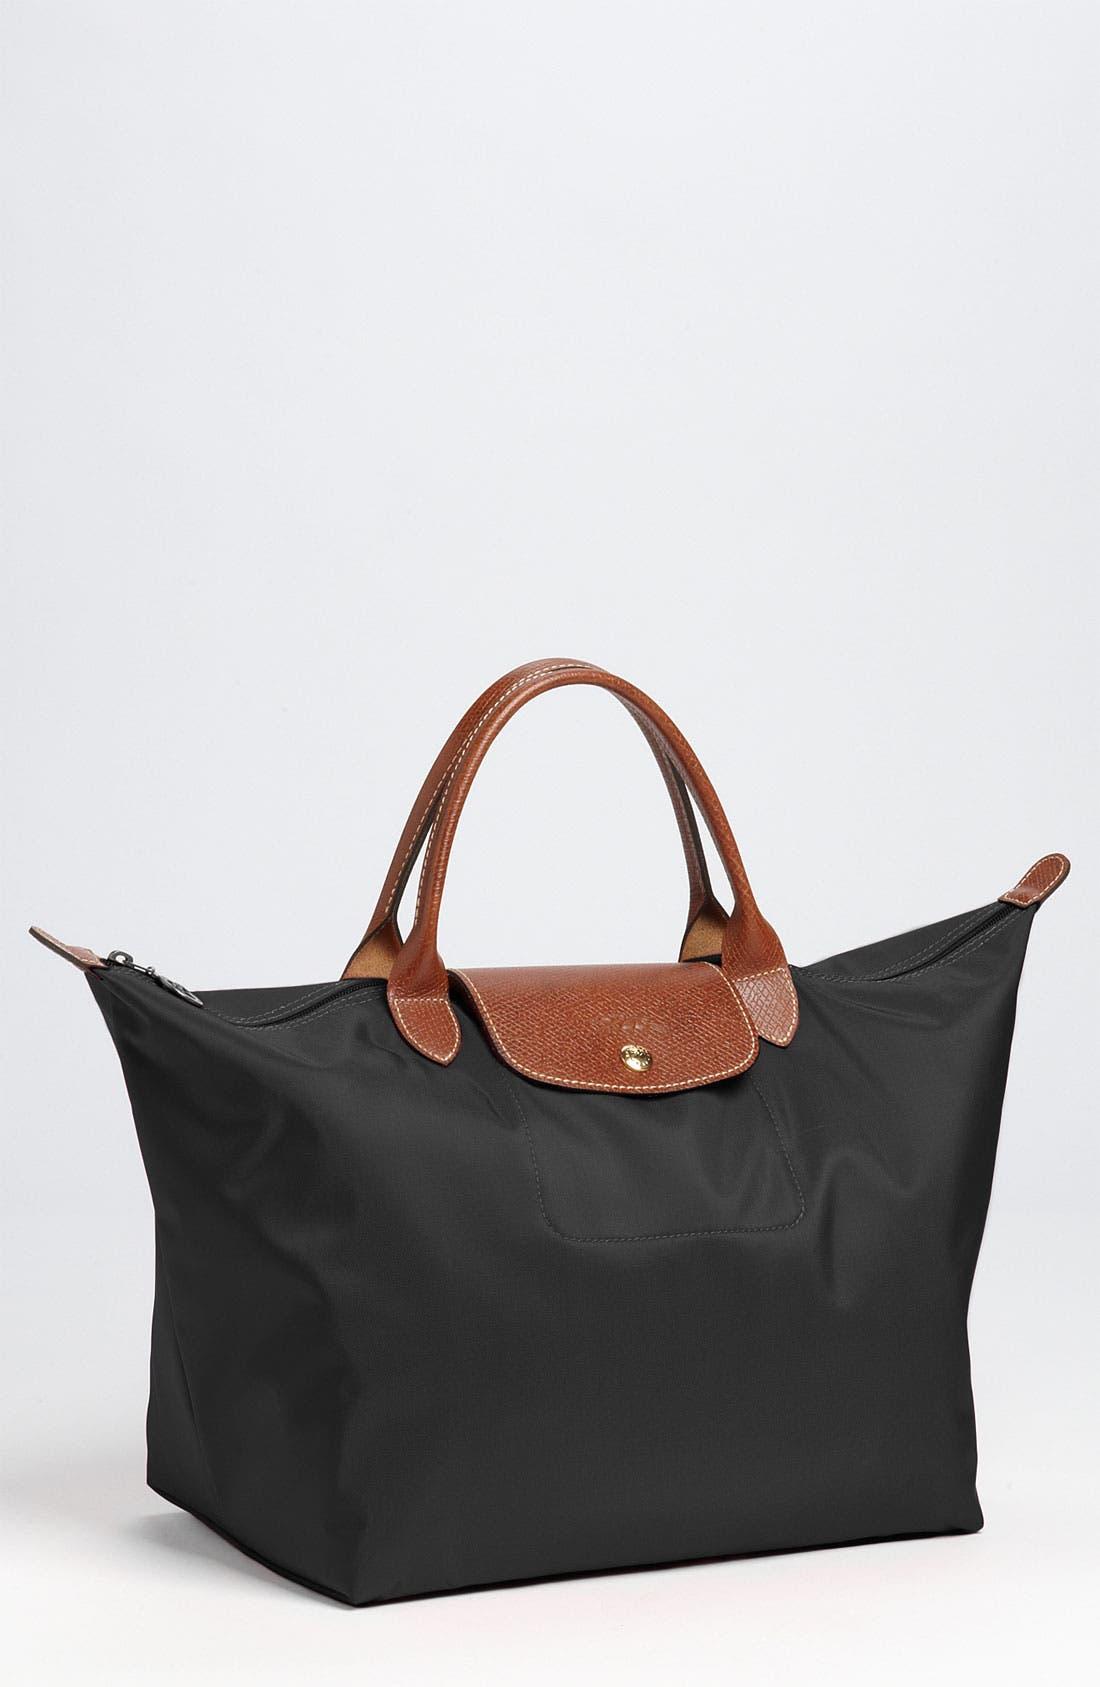 Main Image - Longchamp 'Medium Le Pliage' Tote